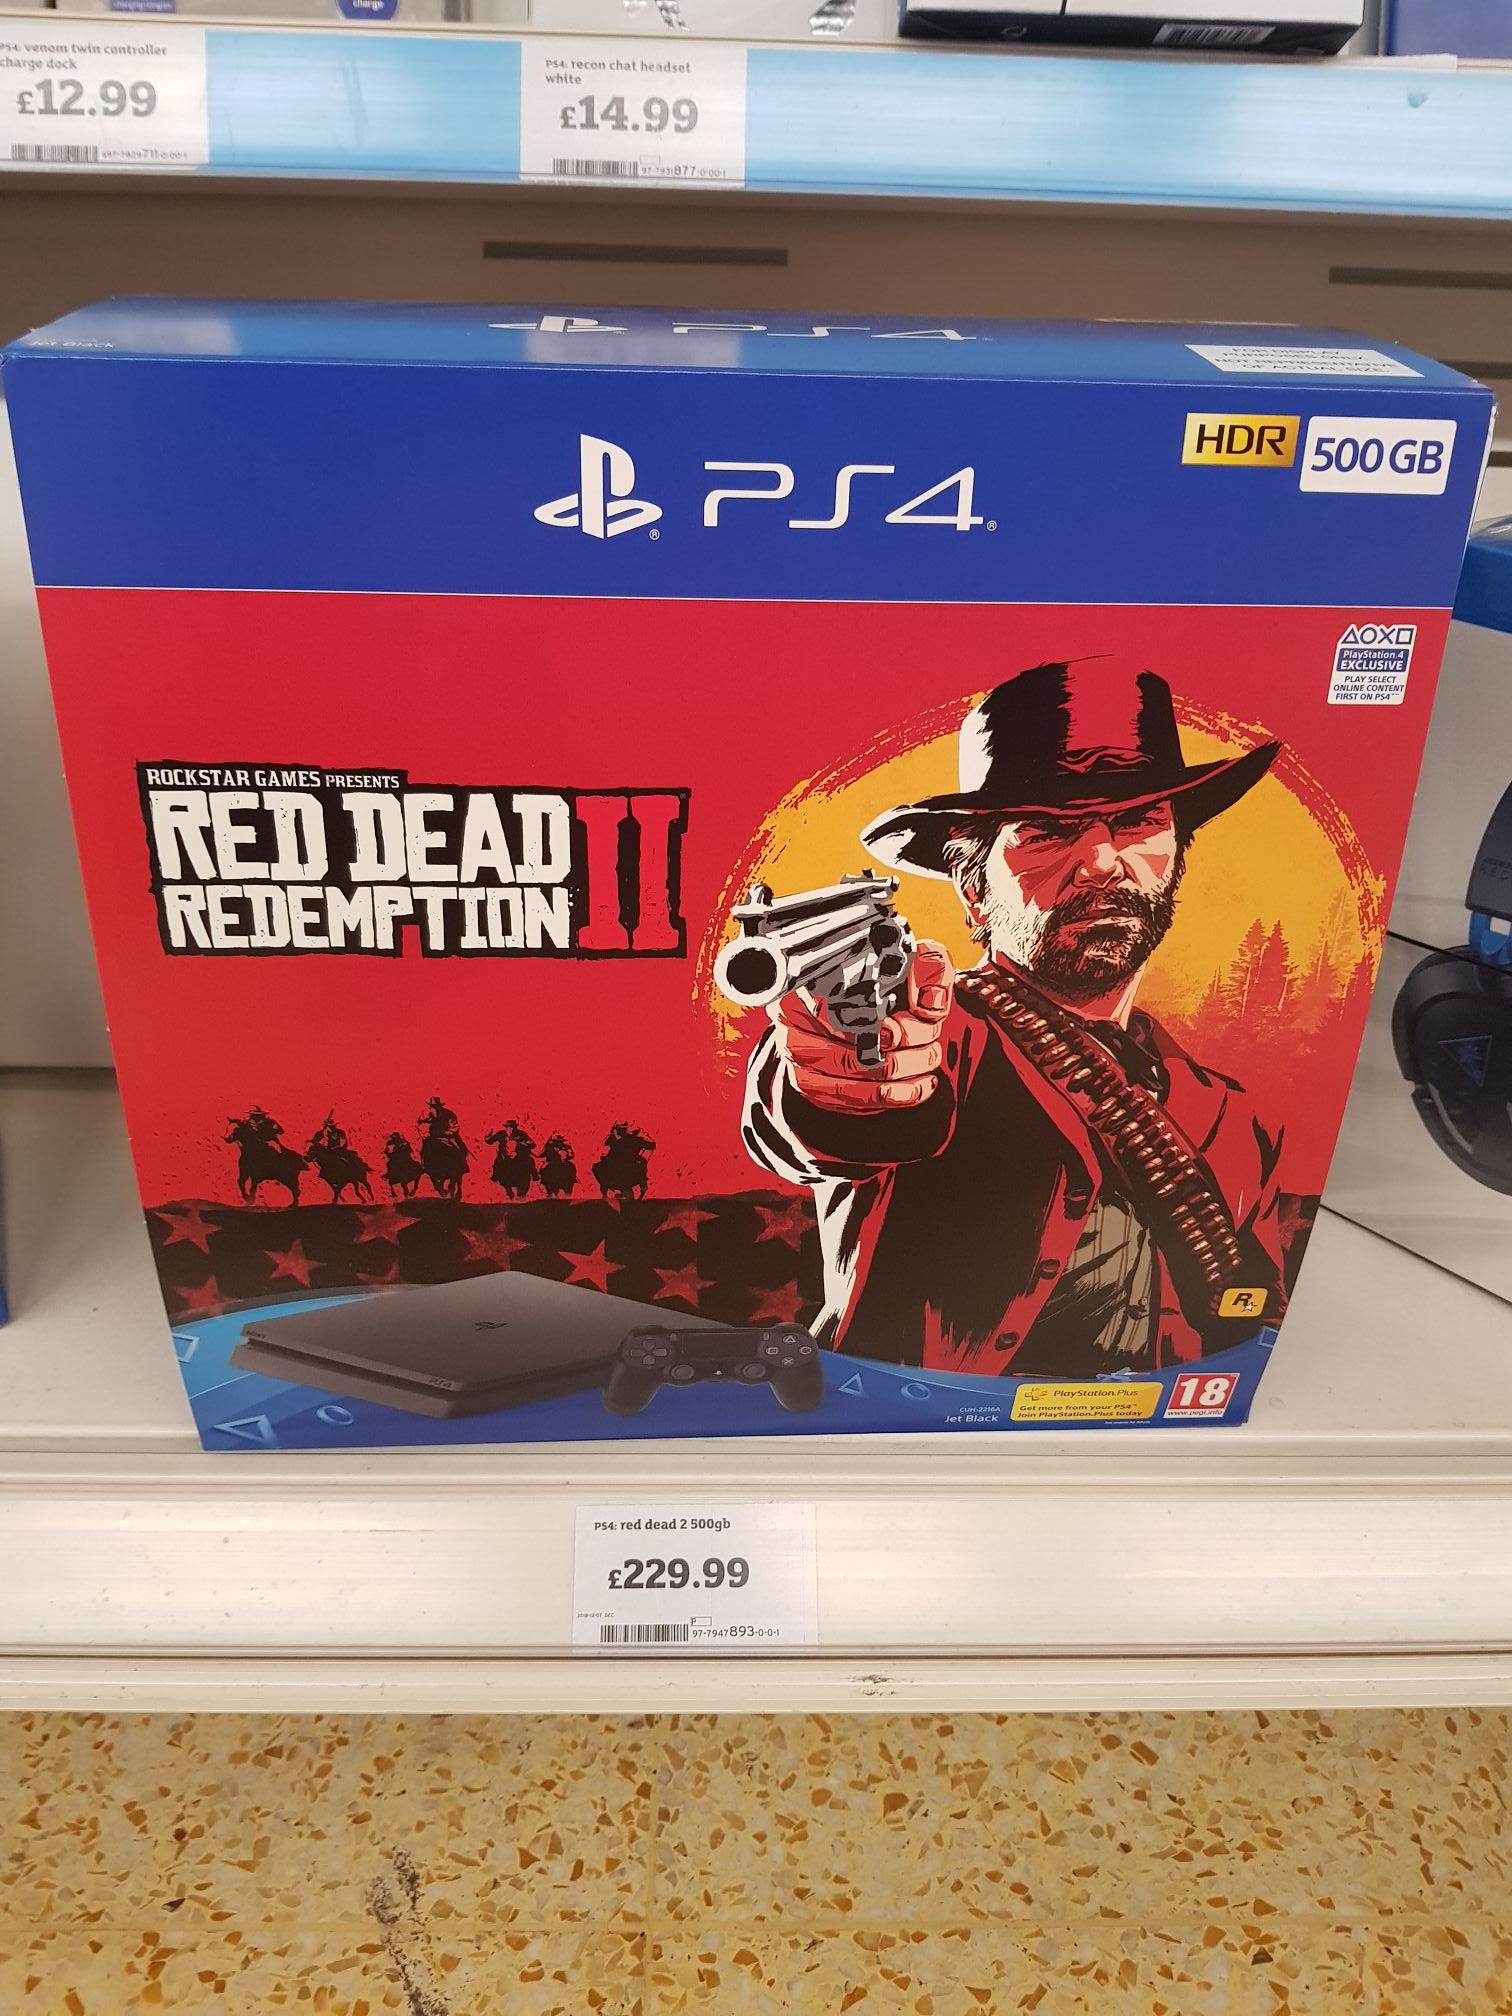 PS4 slim 500gb RD2D bundle Sainsburys in-store £229.99